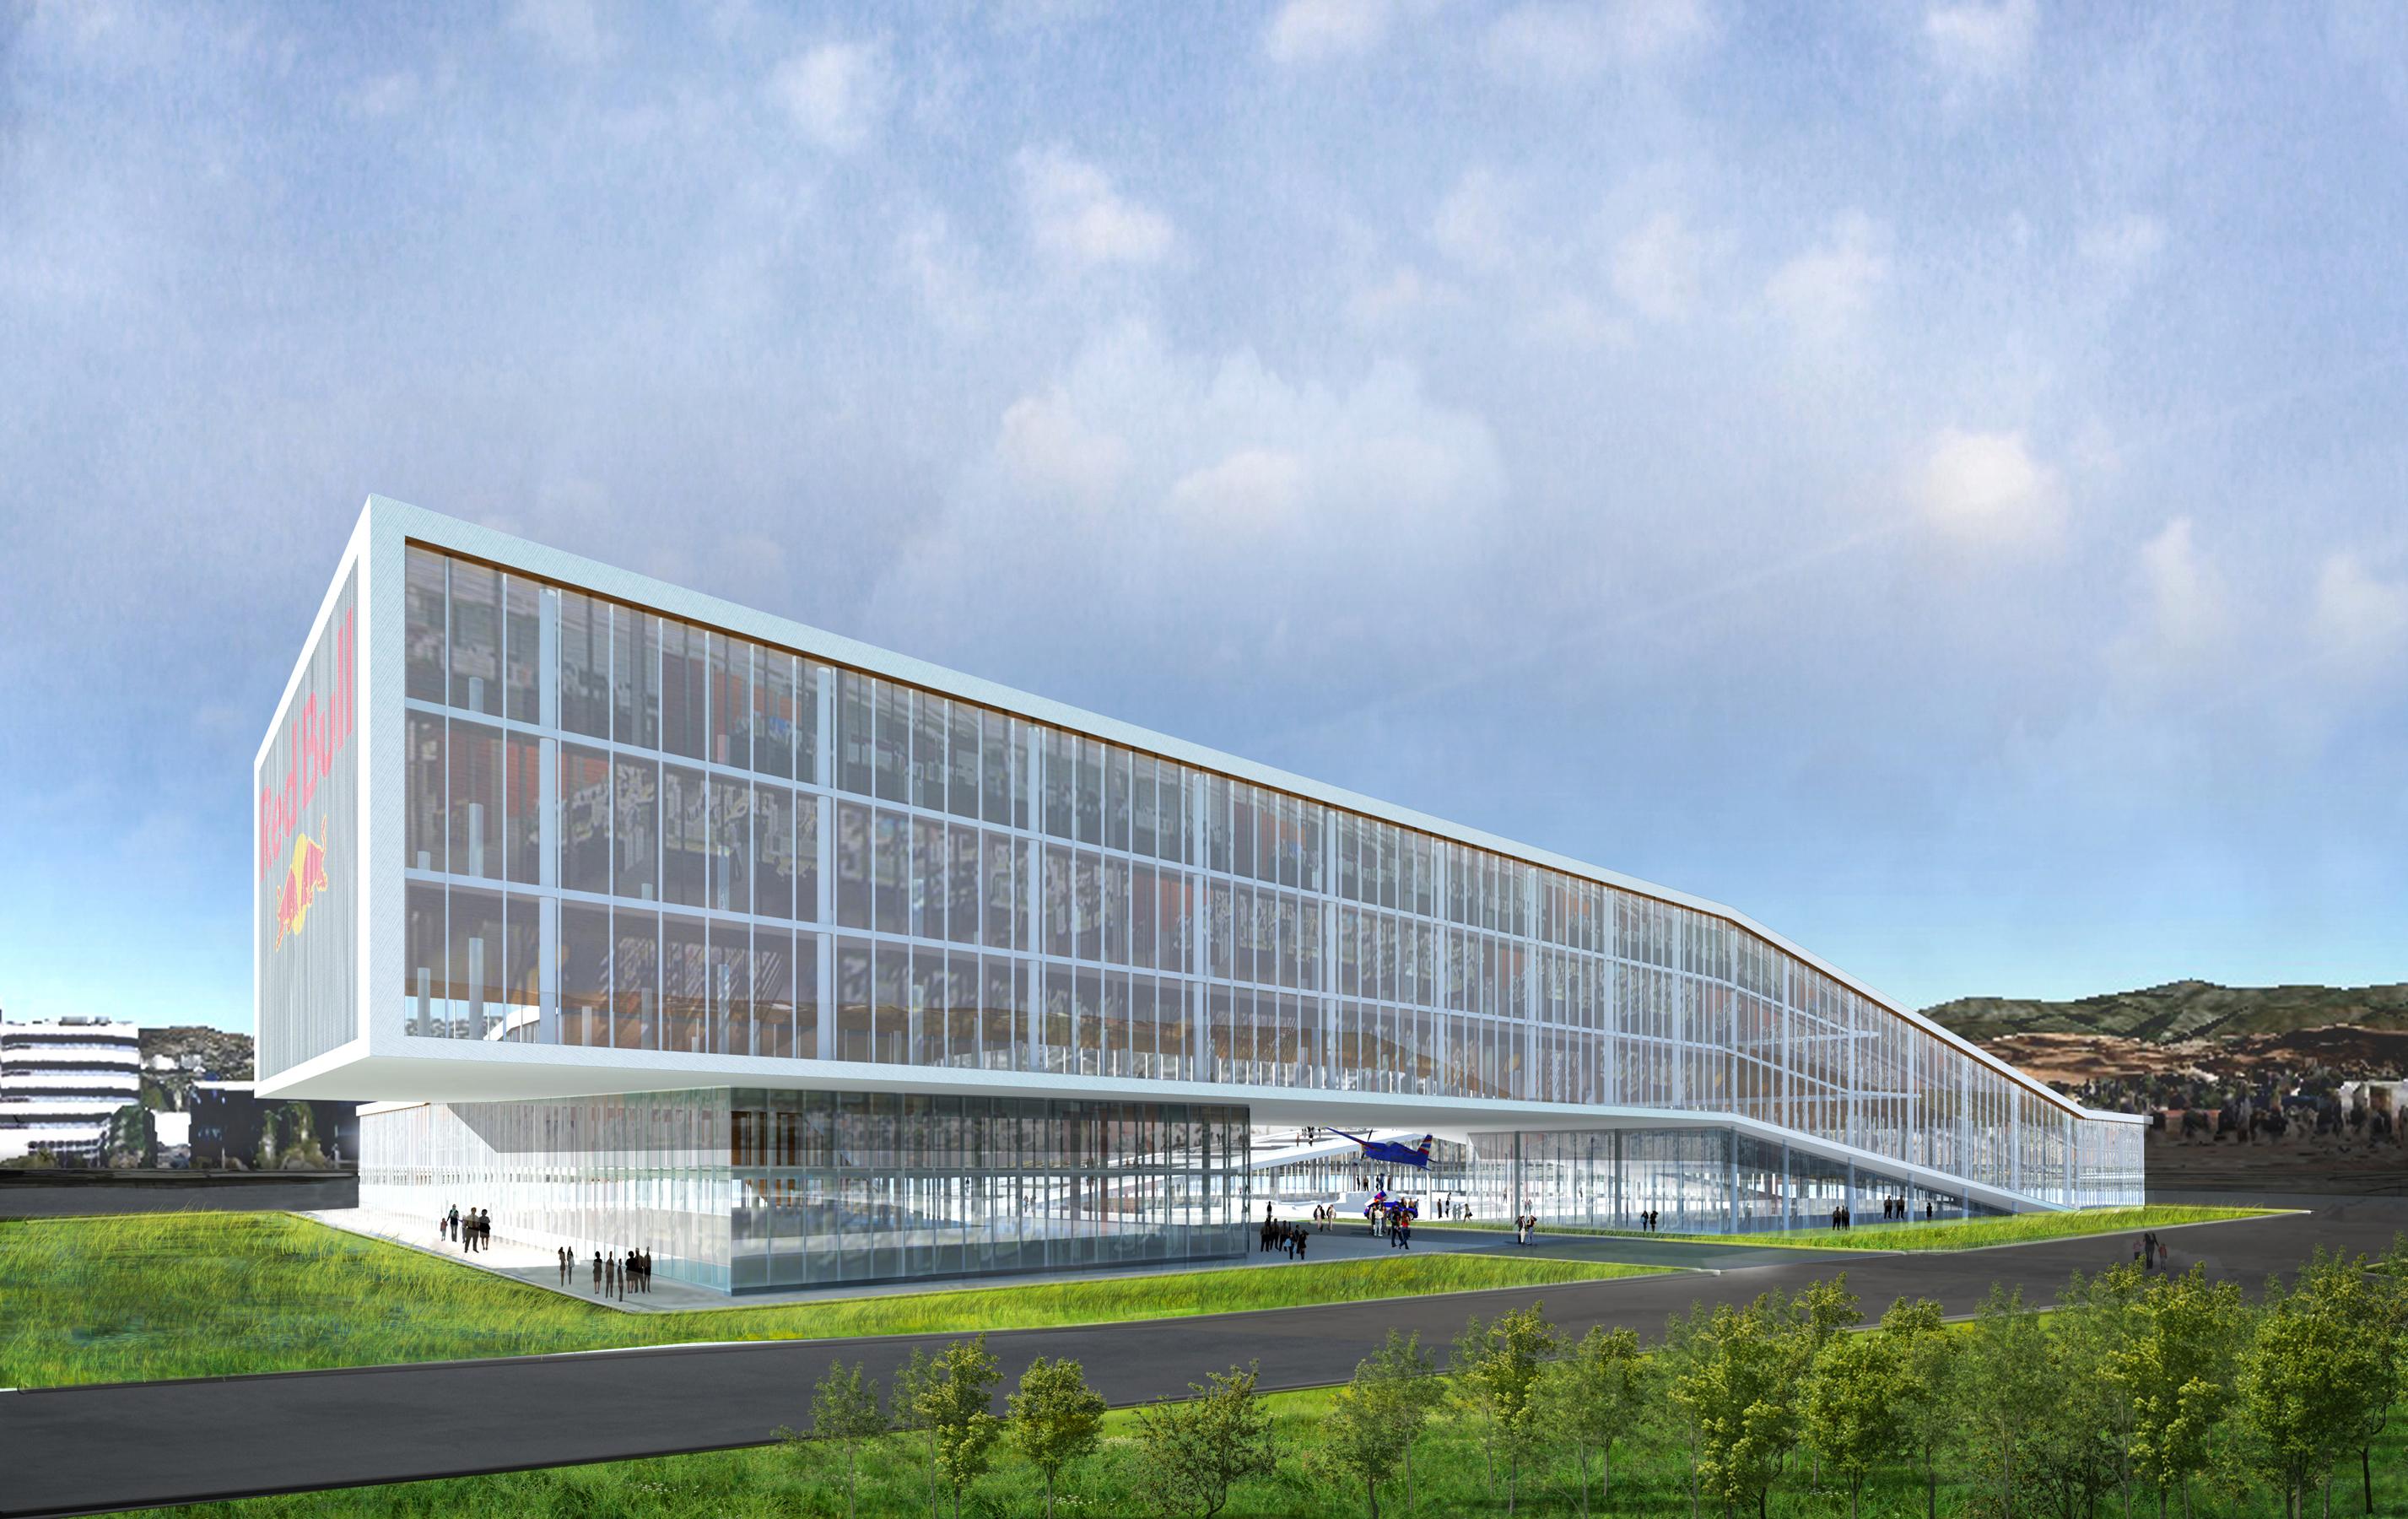 12 Red Bull Headquarters North America open studio architecture OSA - Option 1 exterior rendering